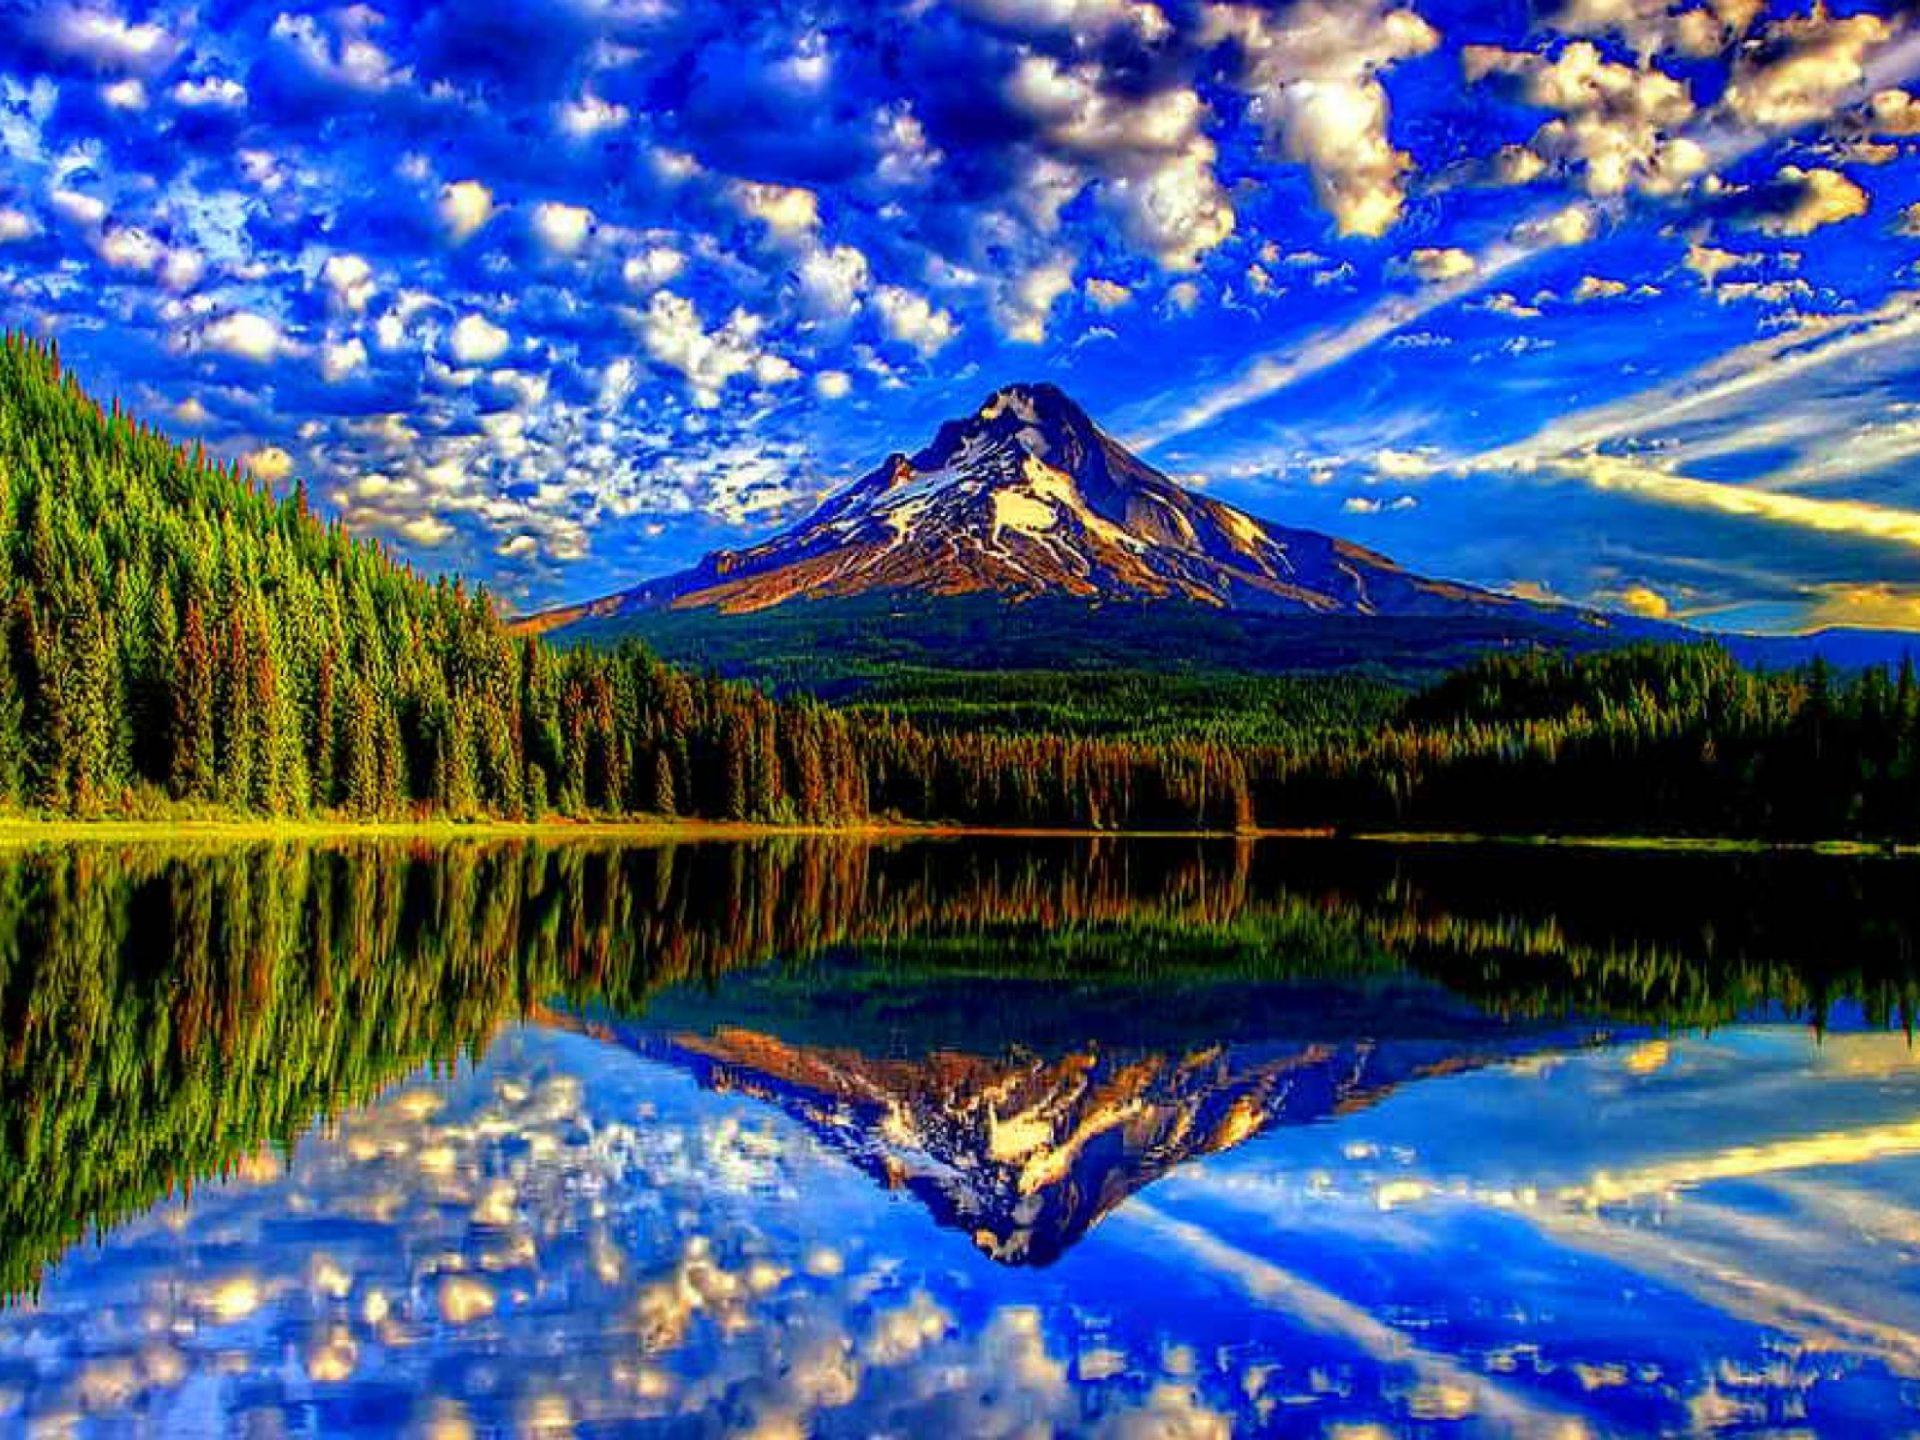 White Wallpaper Iphone 5 Beautiful Hd Wallpaper Blue Sky And White Cloud Rock